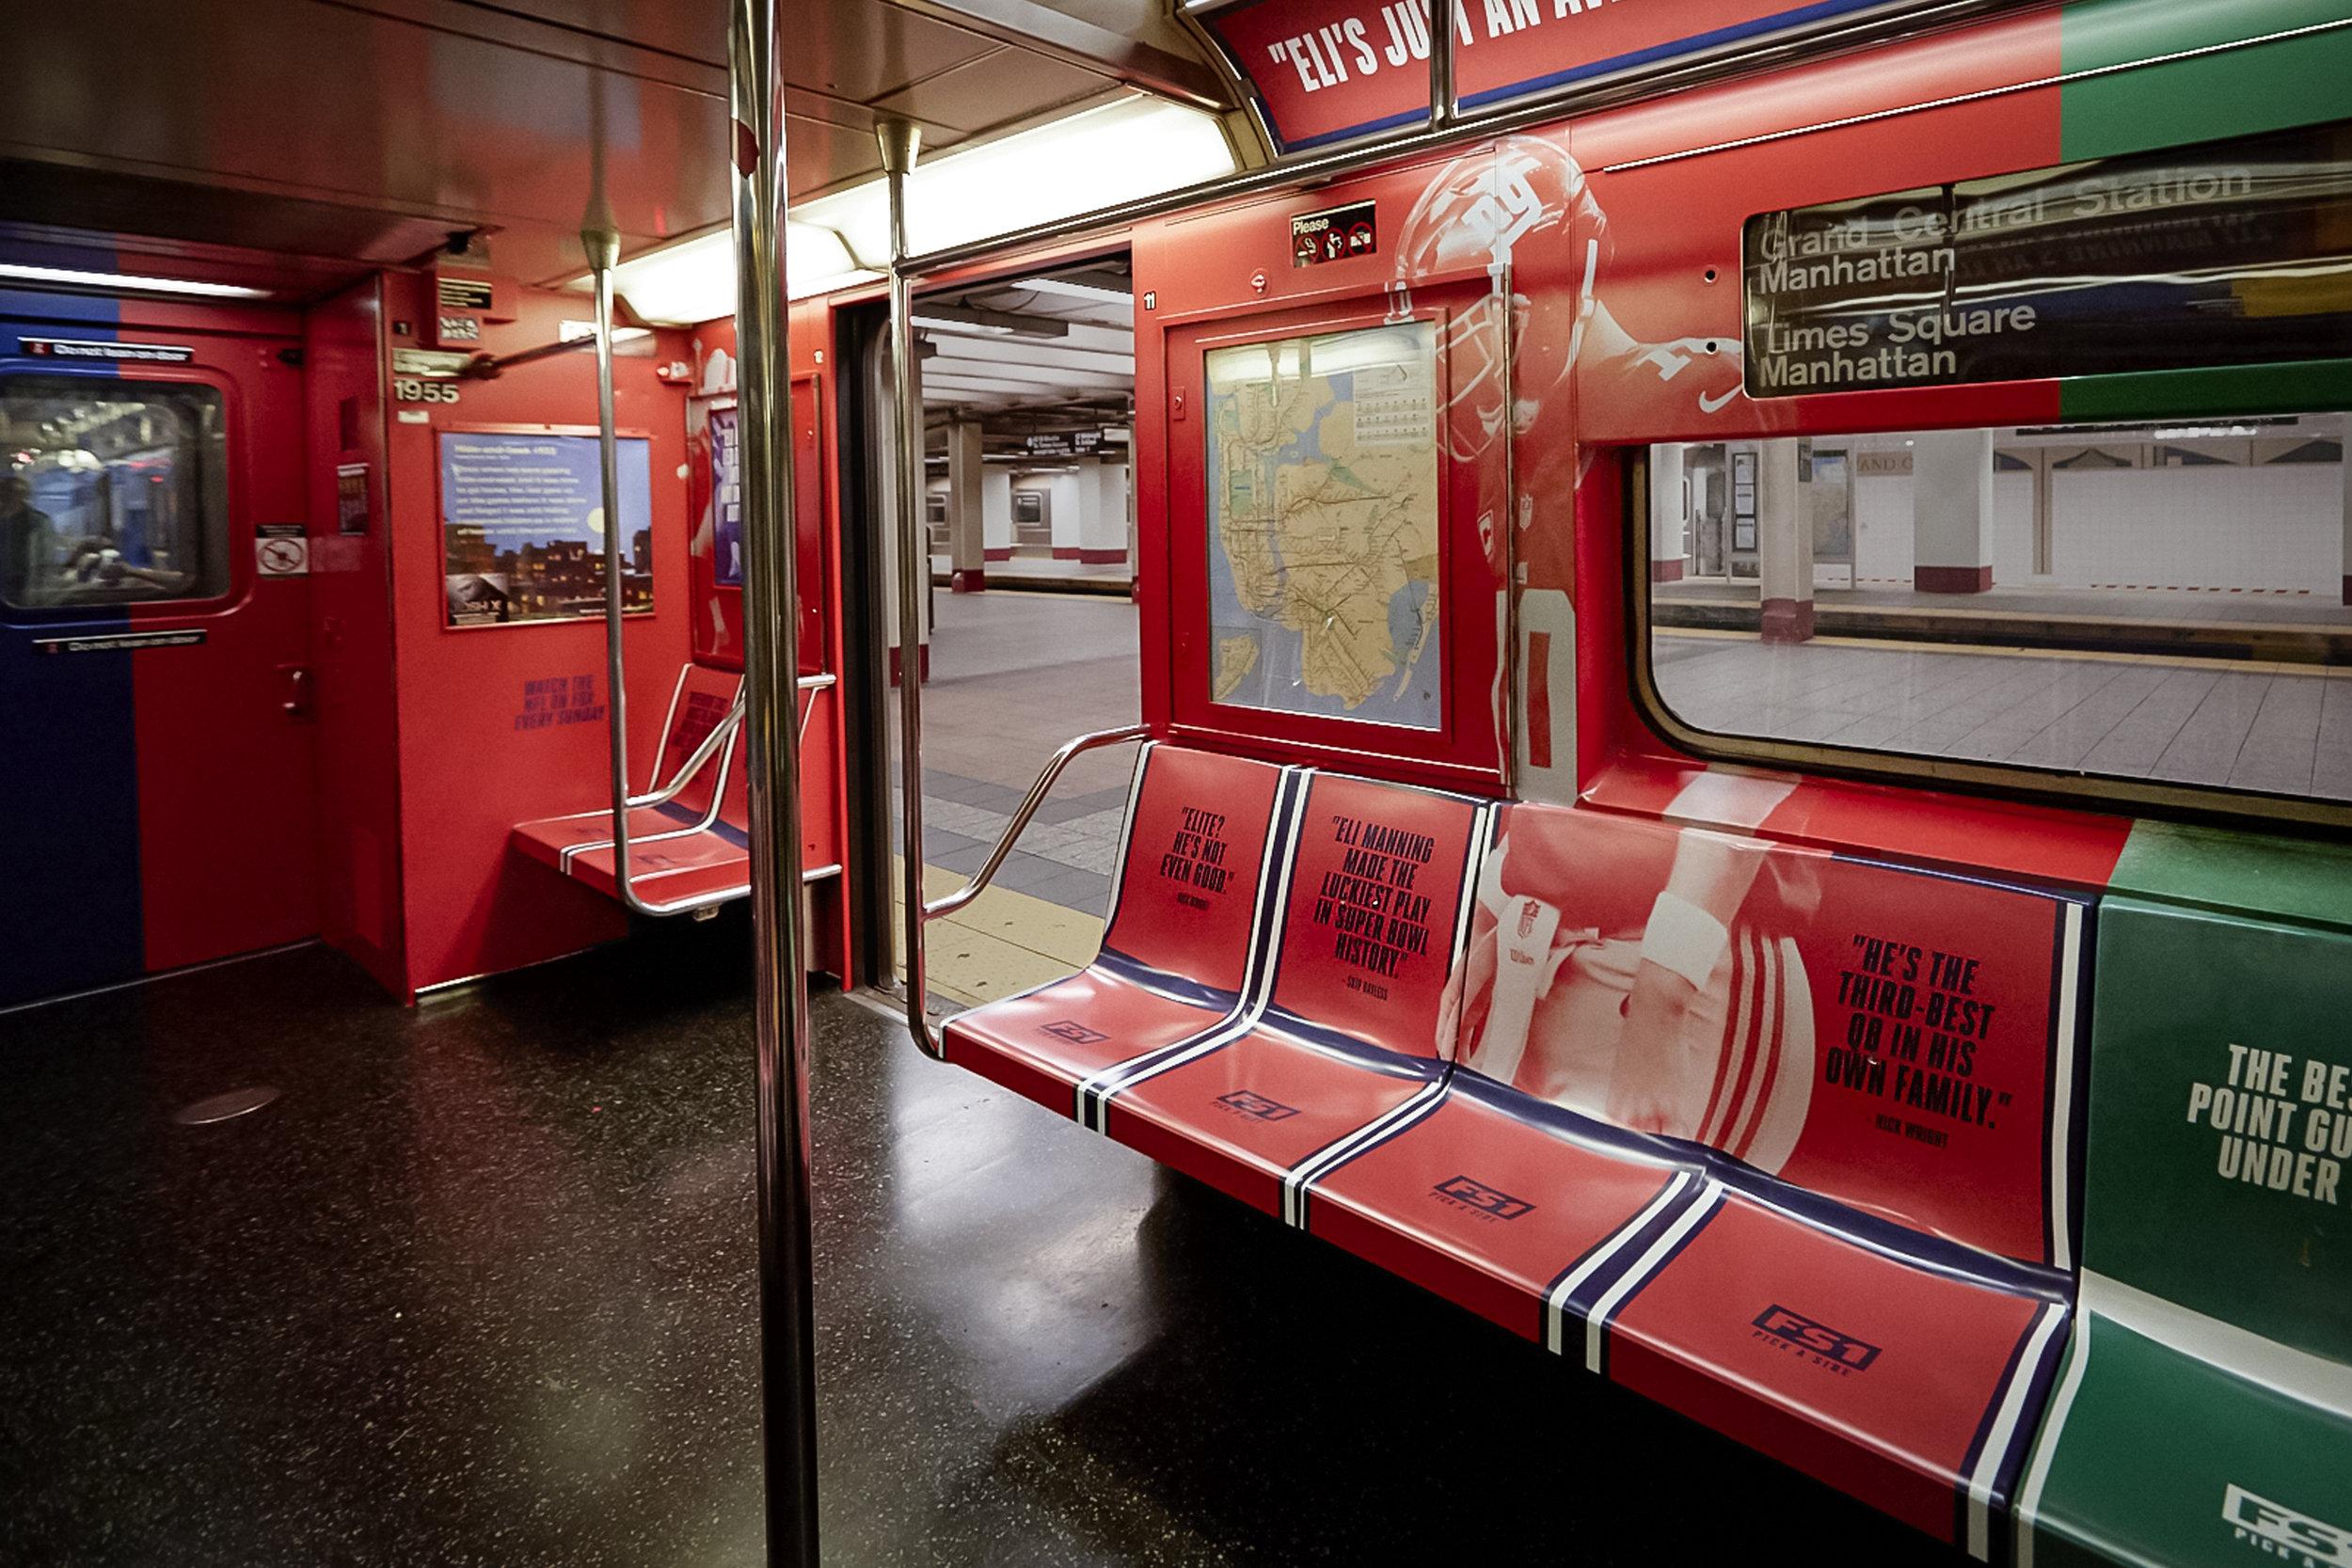 FS1_subway_shots_39.jpg